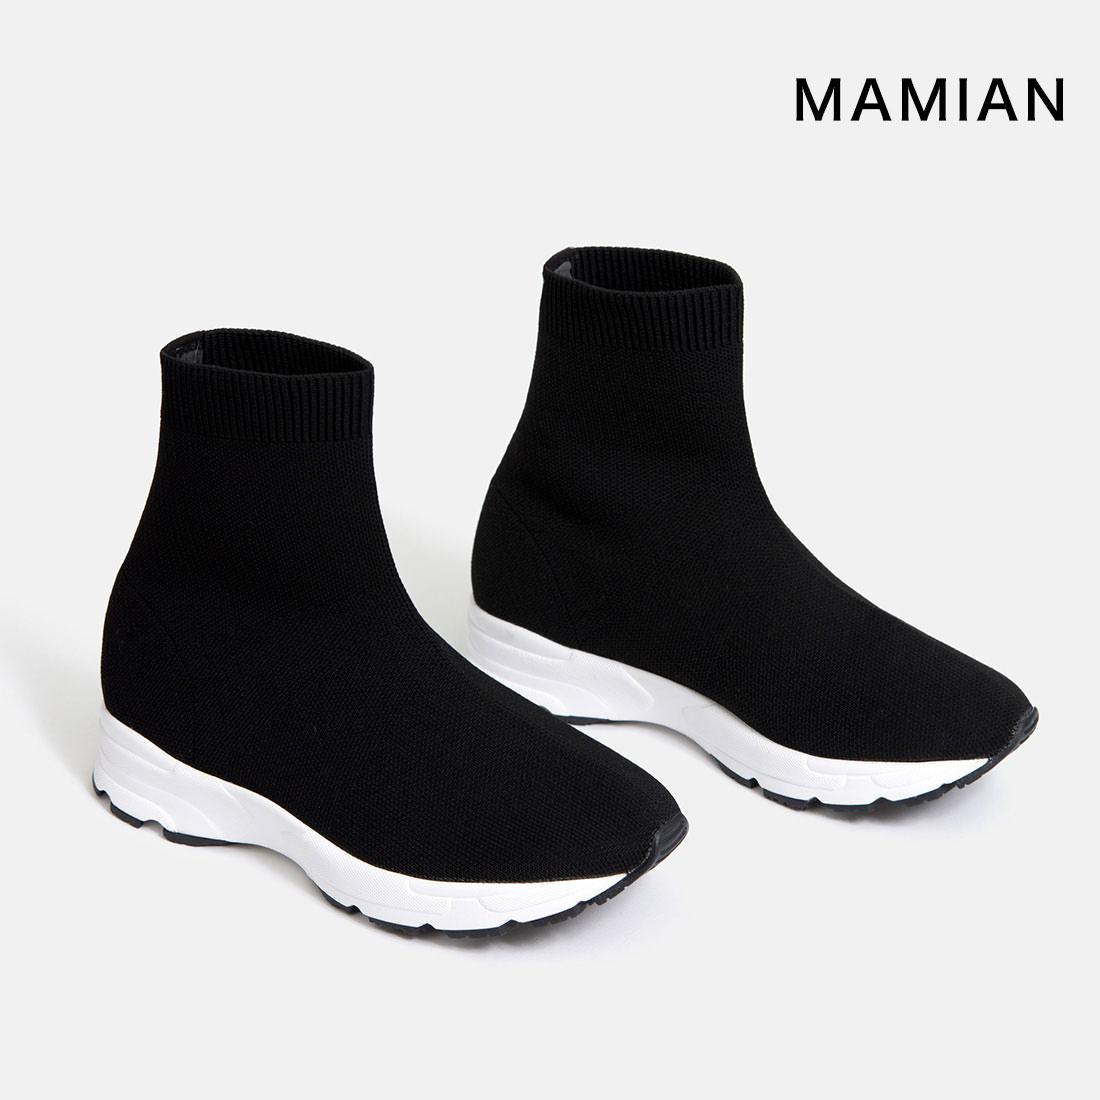 【30%OFF:Winter SALE】スニーカー ソックスブーツ ショート 美脚 足が痛くない(なりにくい)ブーツ 日本製 ブラック 黒 Black 22.5cm~25.0cm ラウンドトゥスニーカーショートブーツ(3802)